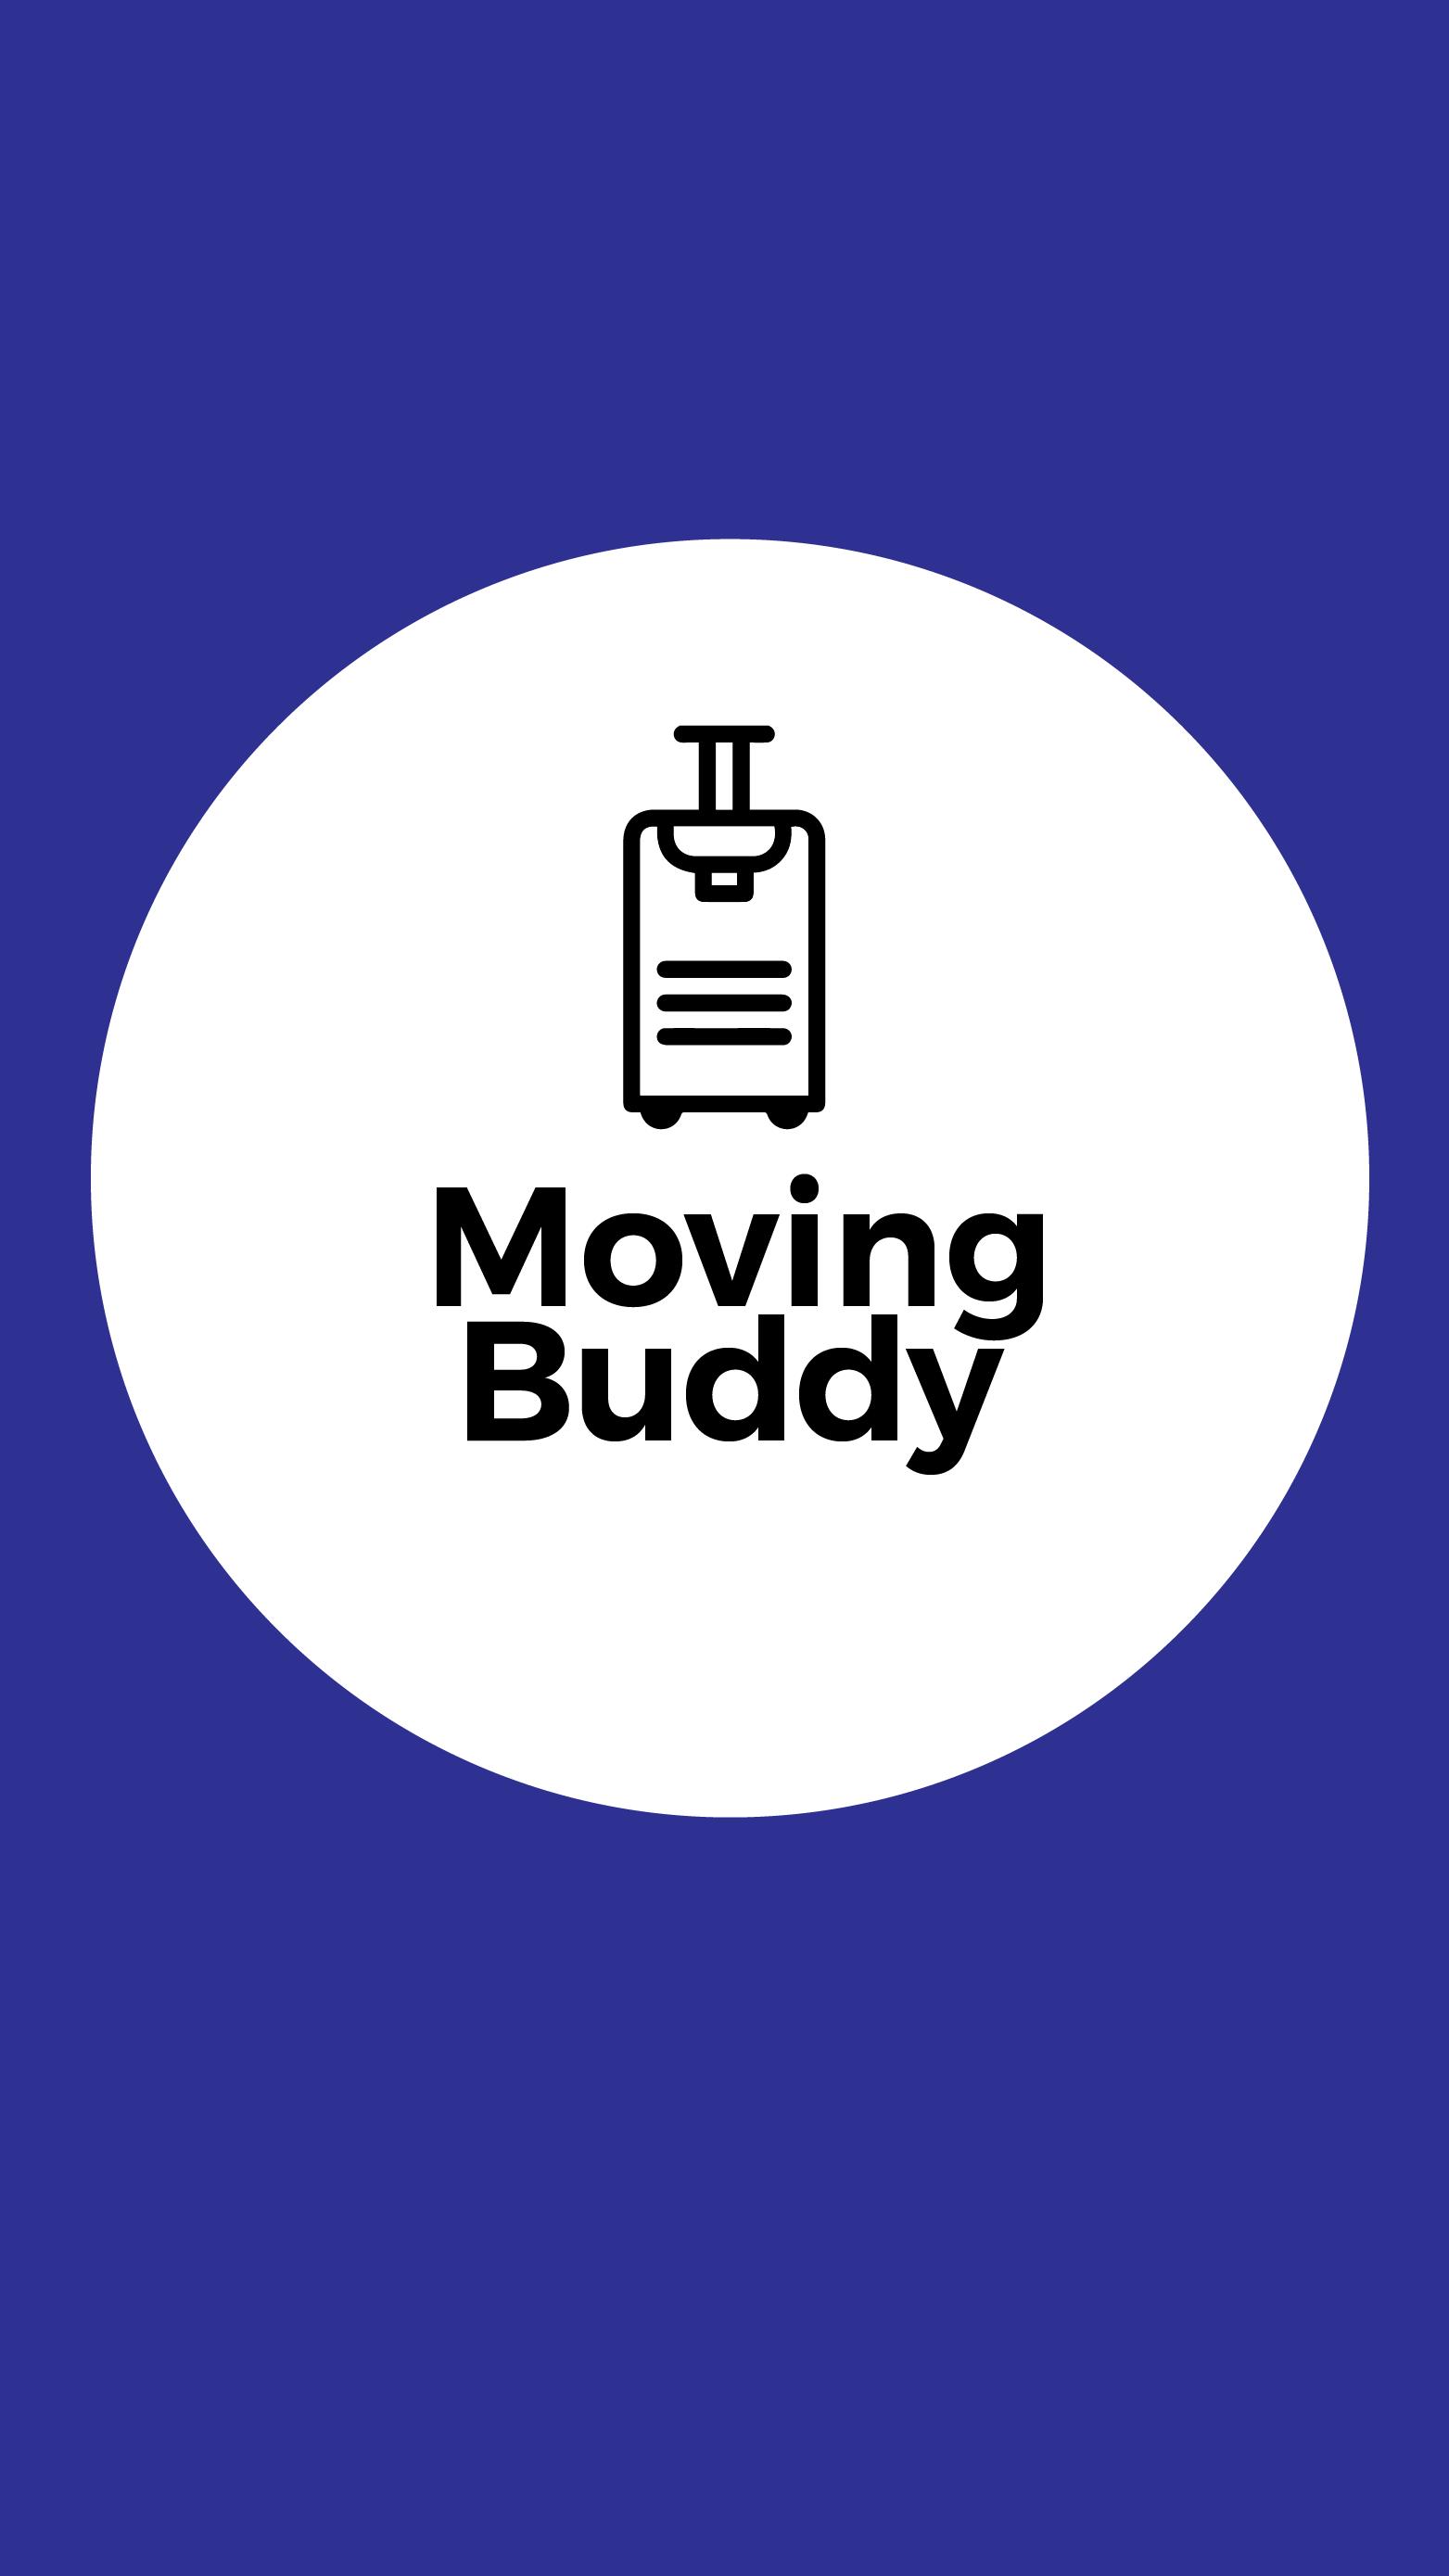 movingBuddy_v6_12.10.16-01.png